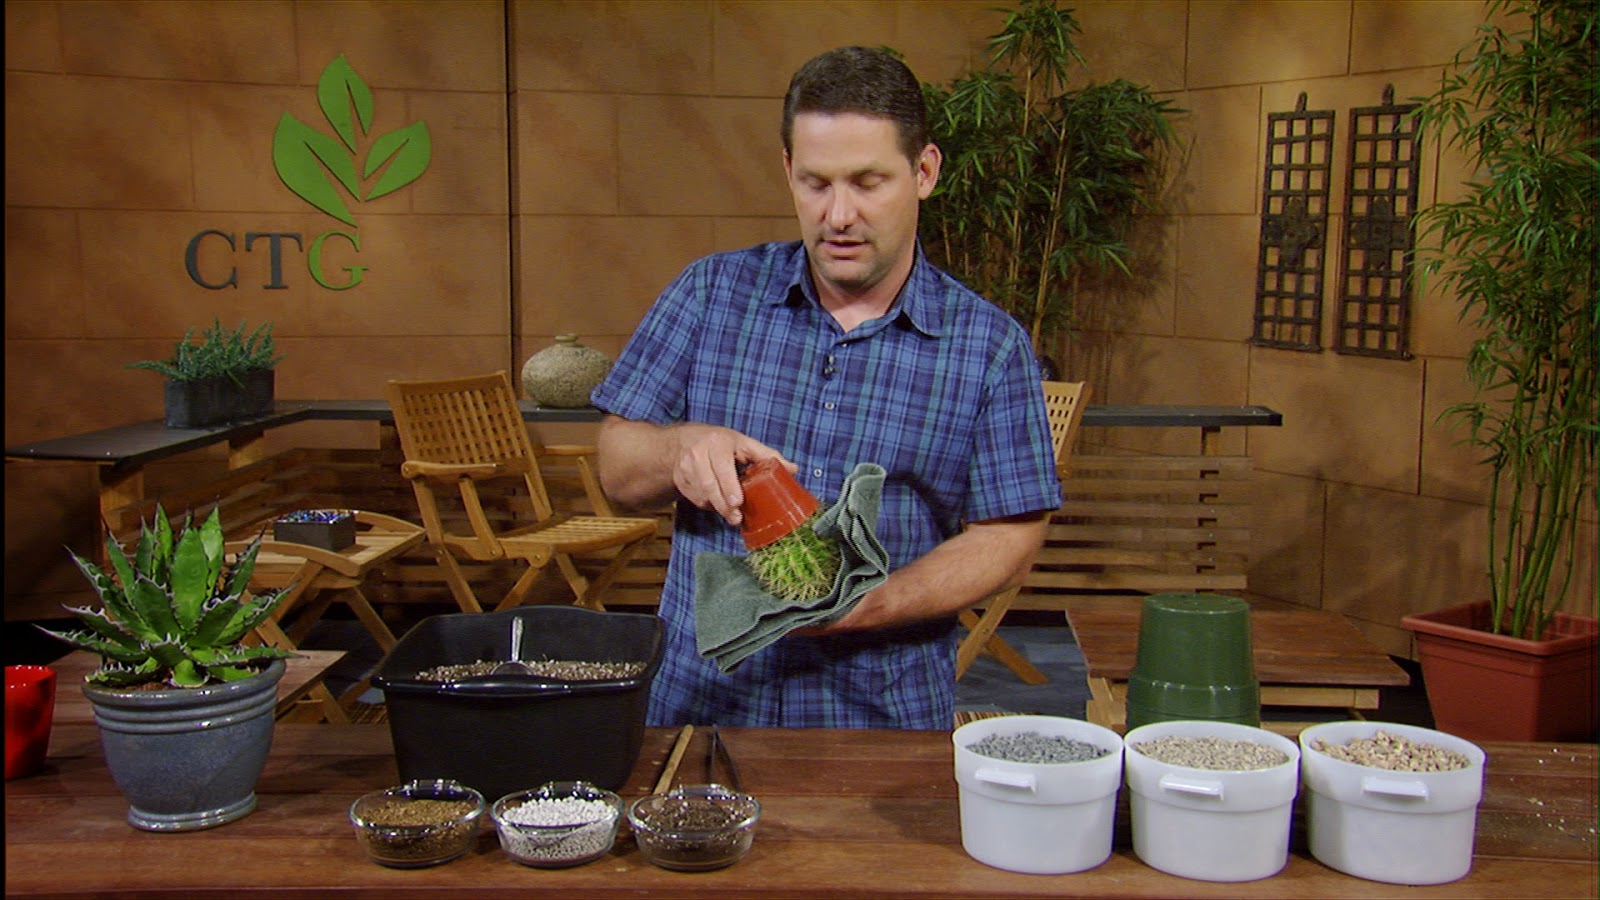 Jeff-Pavlat-repot - Central Texas Gardener Blog